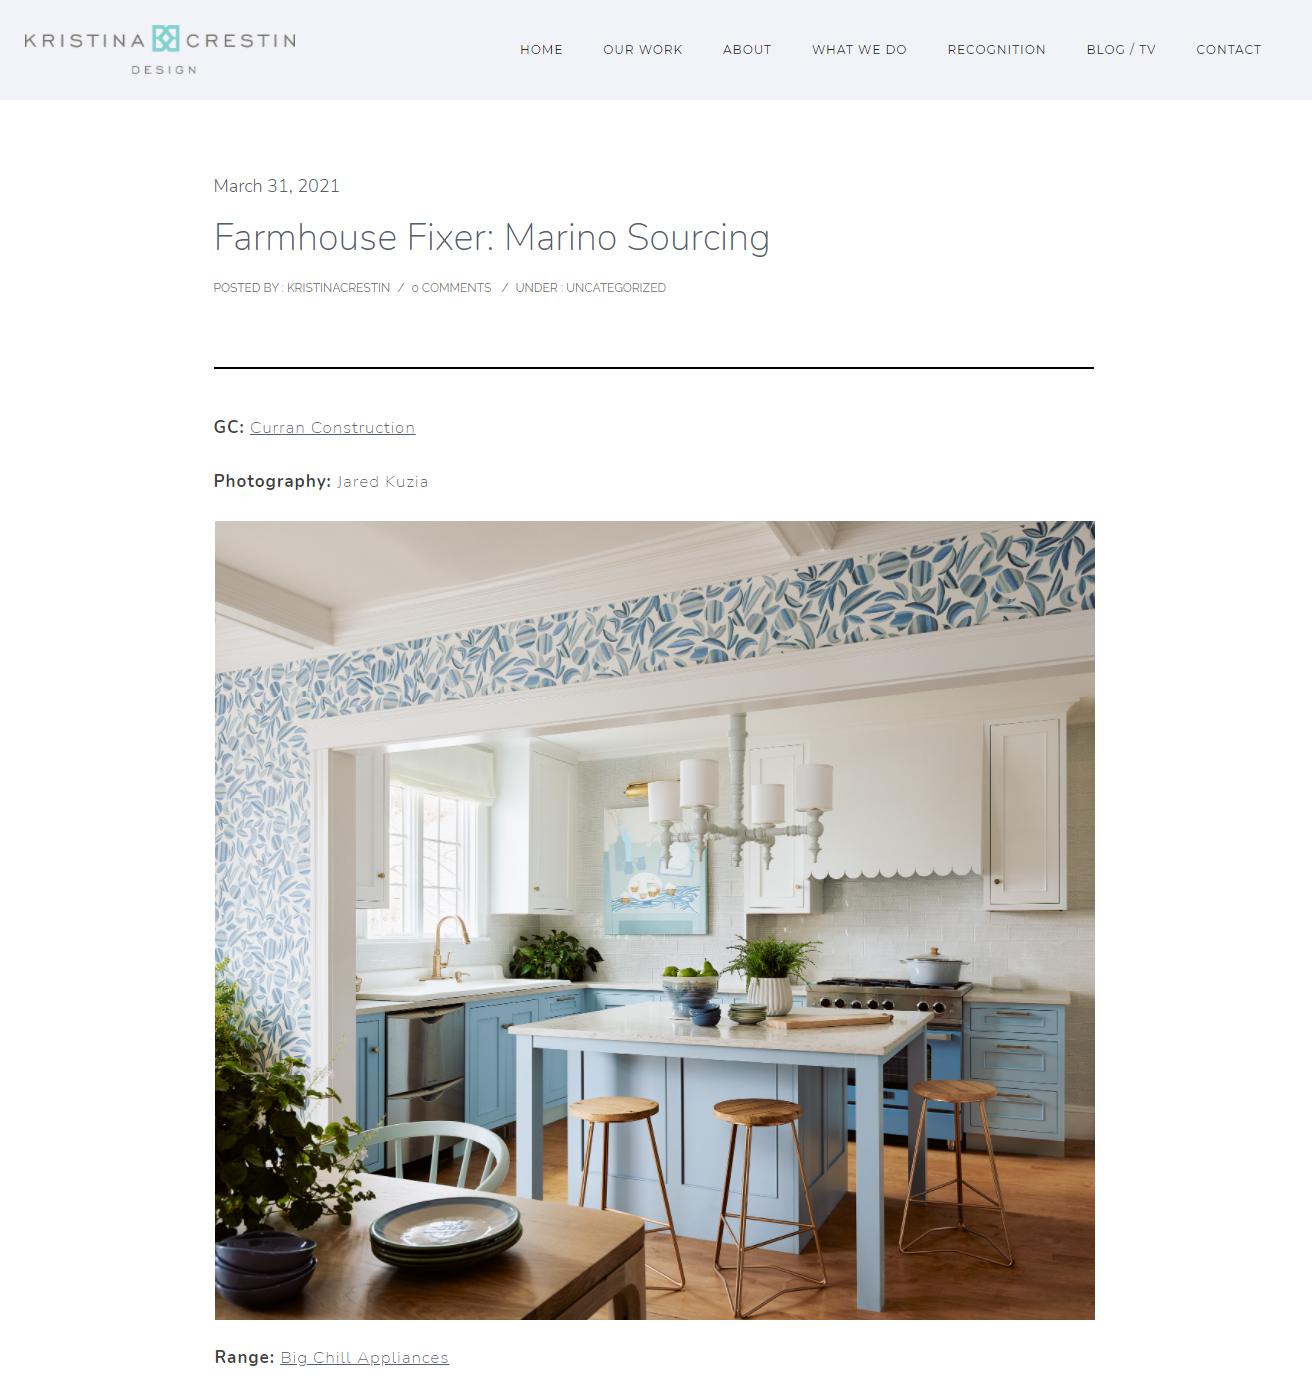 Kristina Crestin Design Blog - March 31, 2021